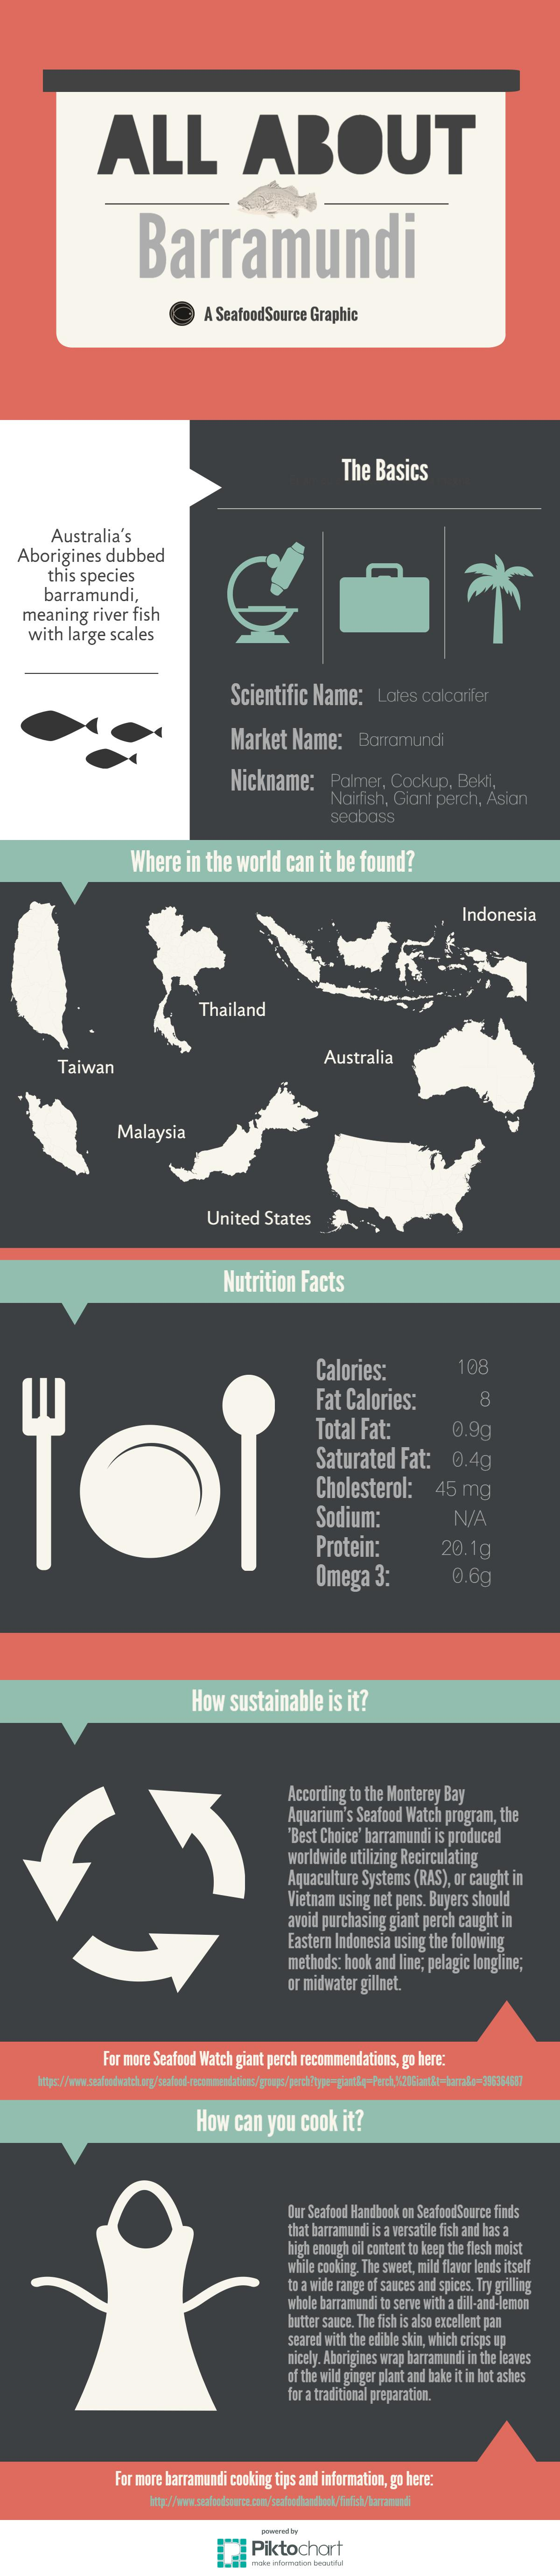 2_Infographic_Barramundi.jpeg